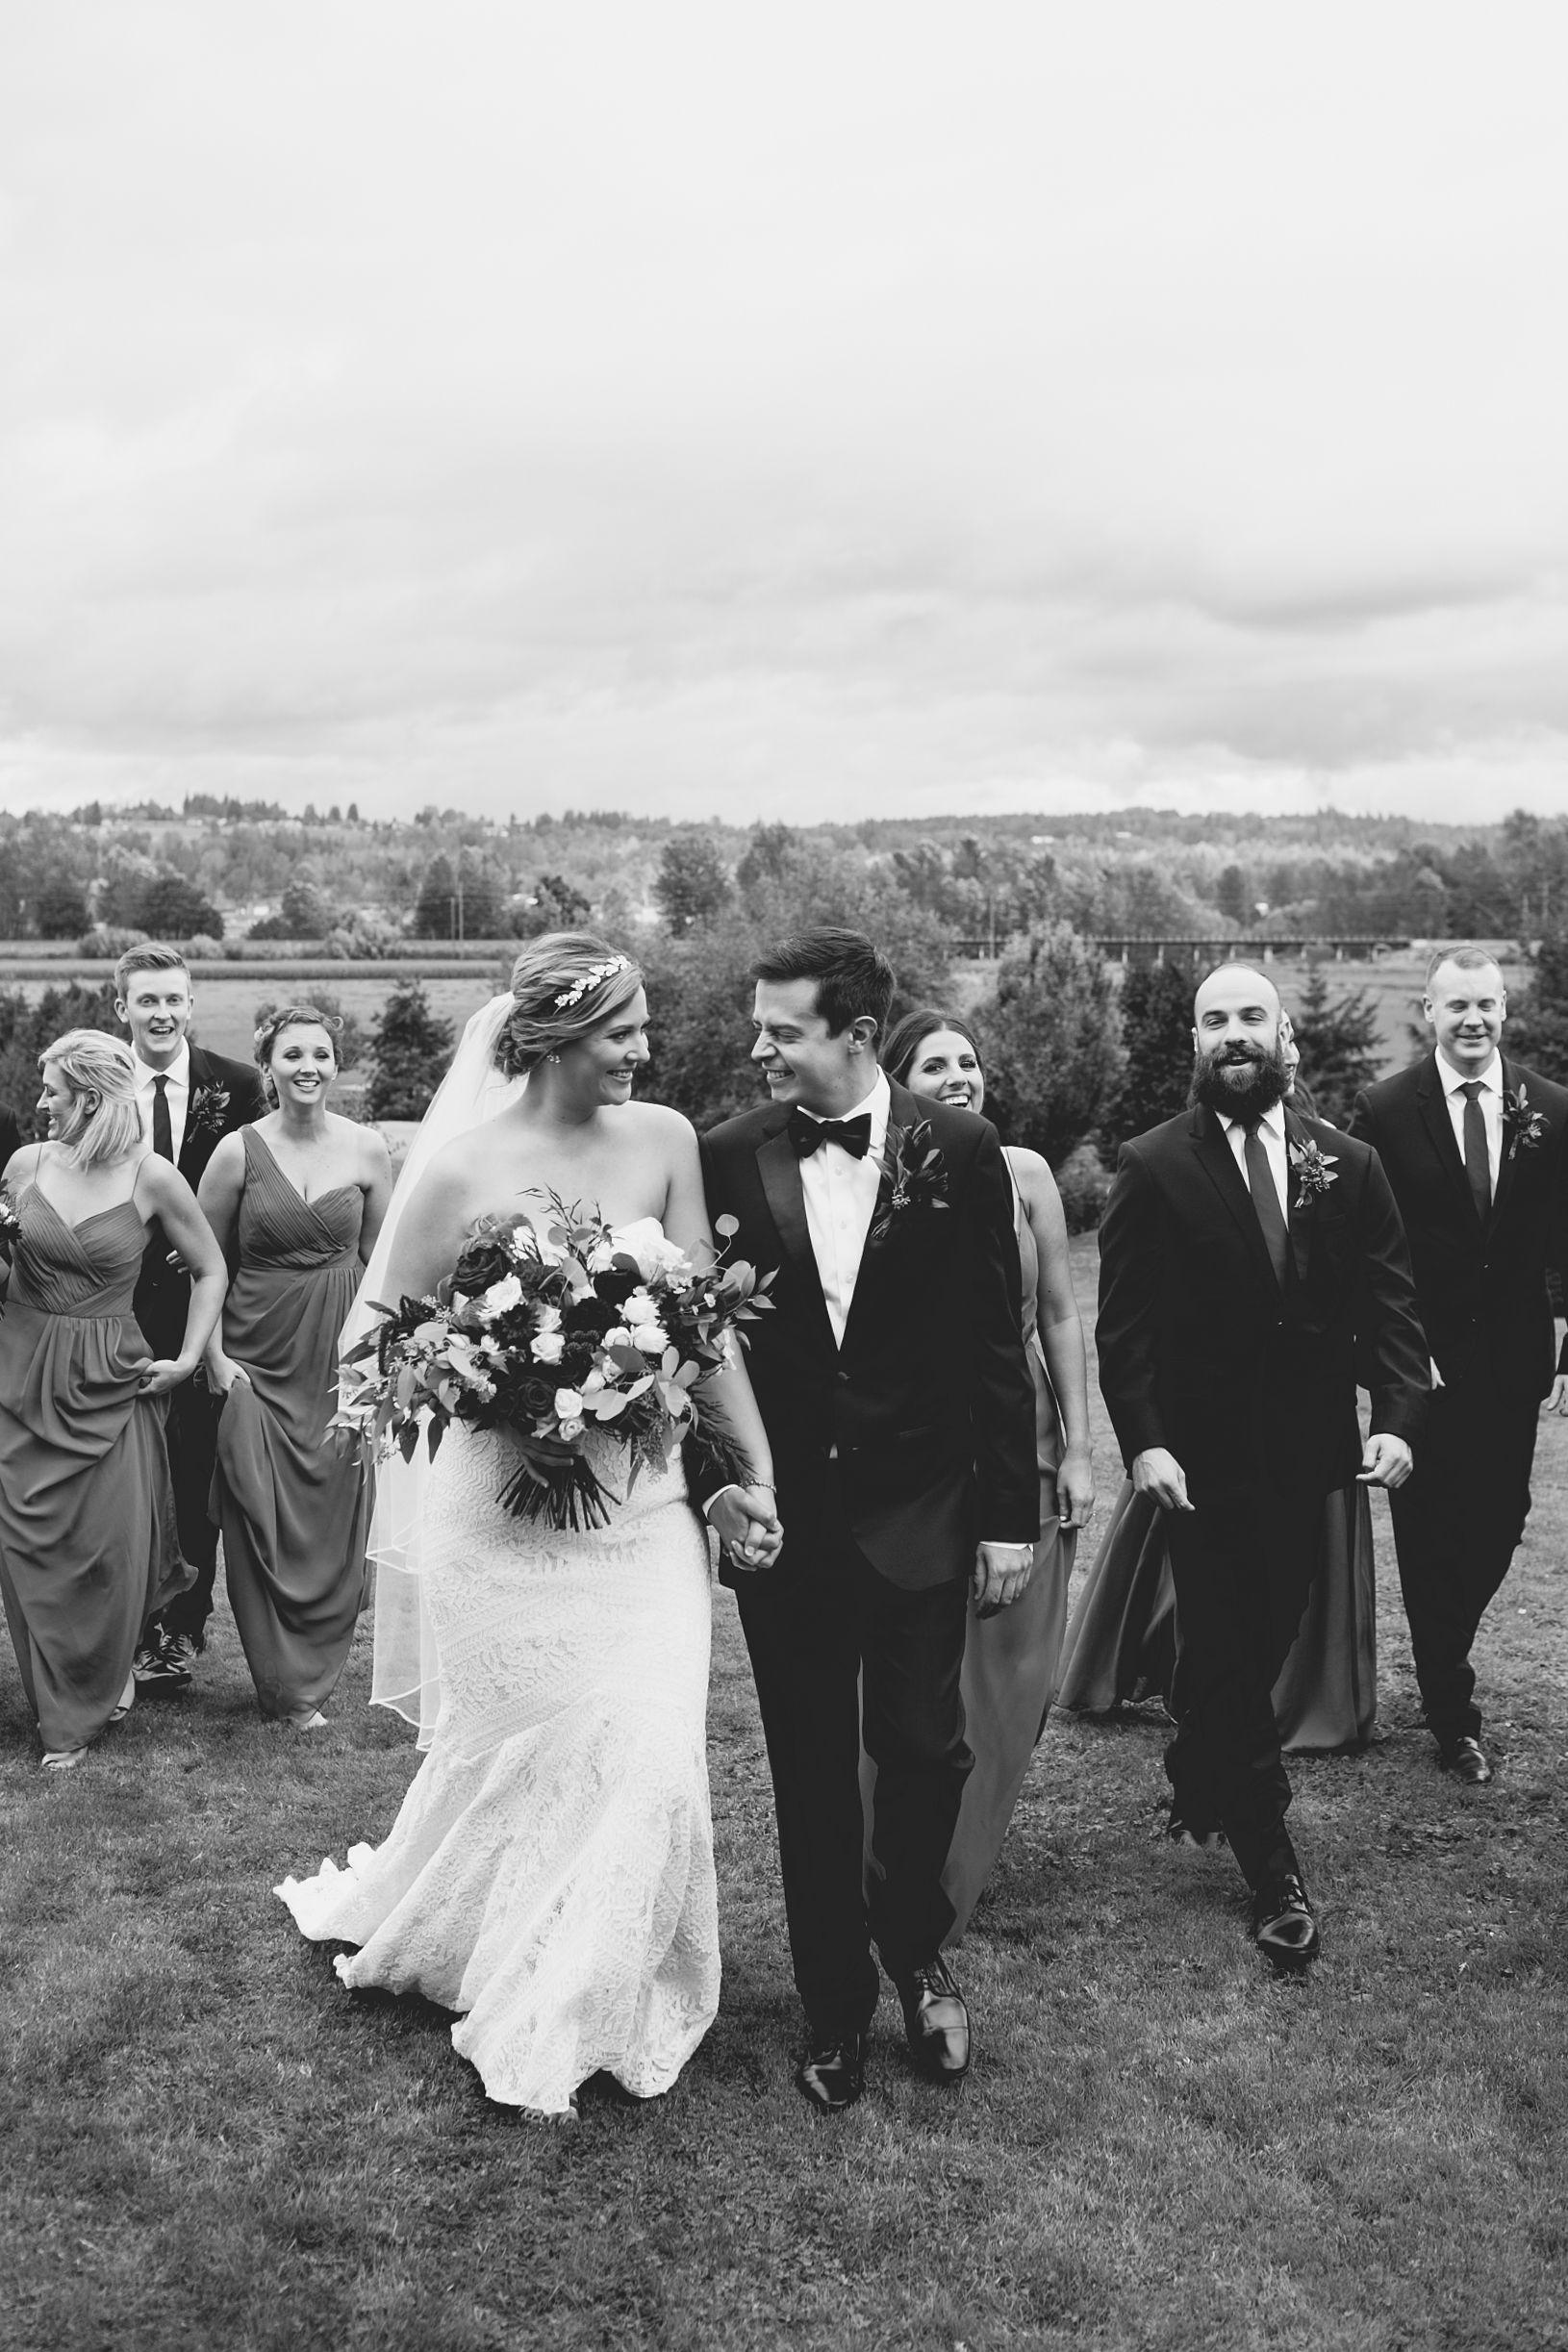 Annie_Matt_WeddingParty-24.jpg